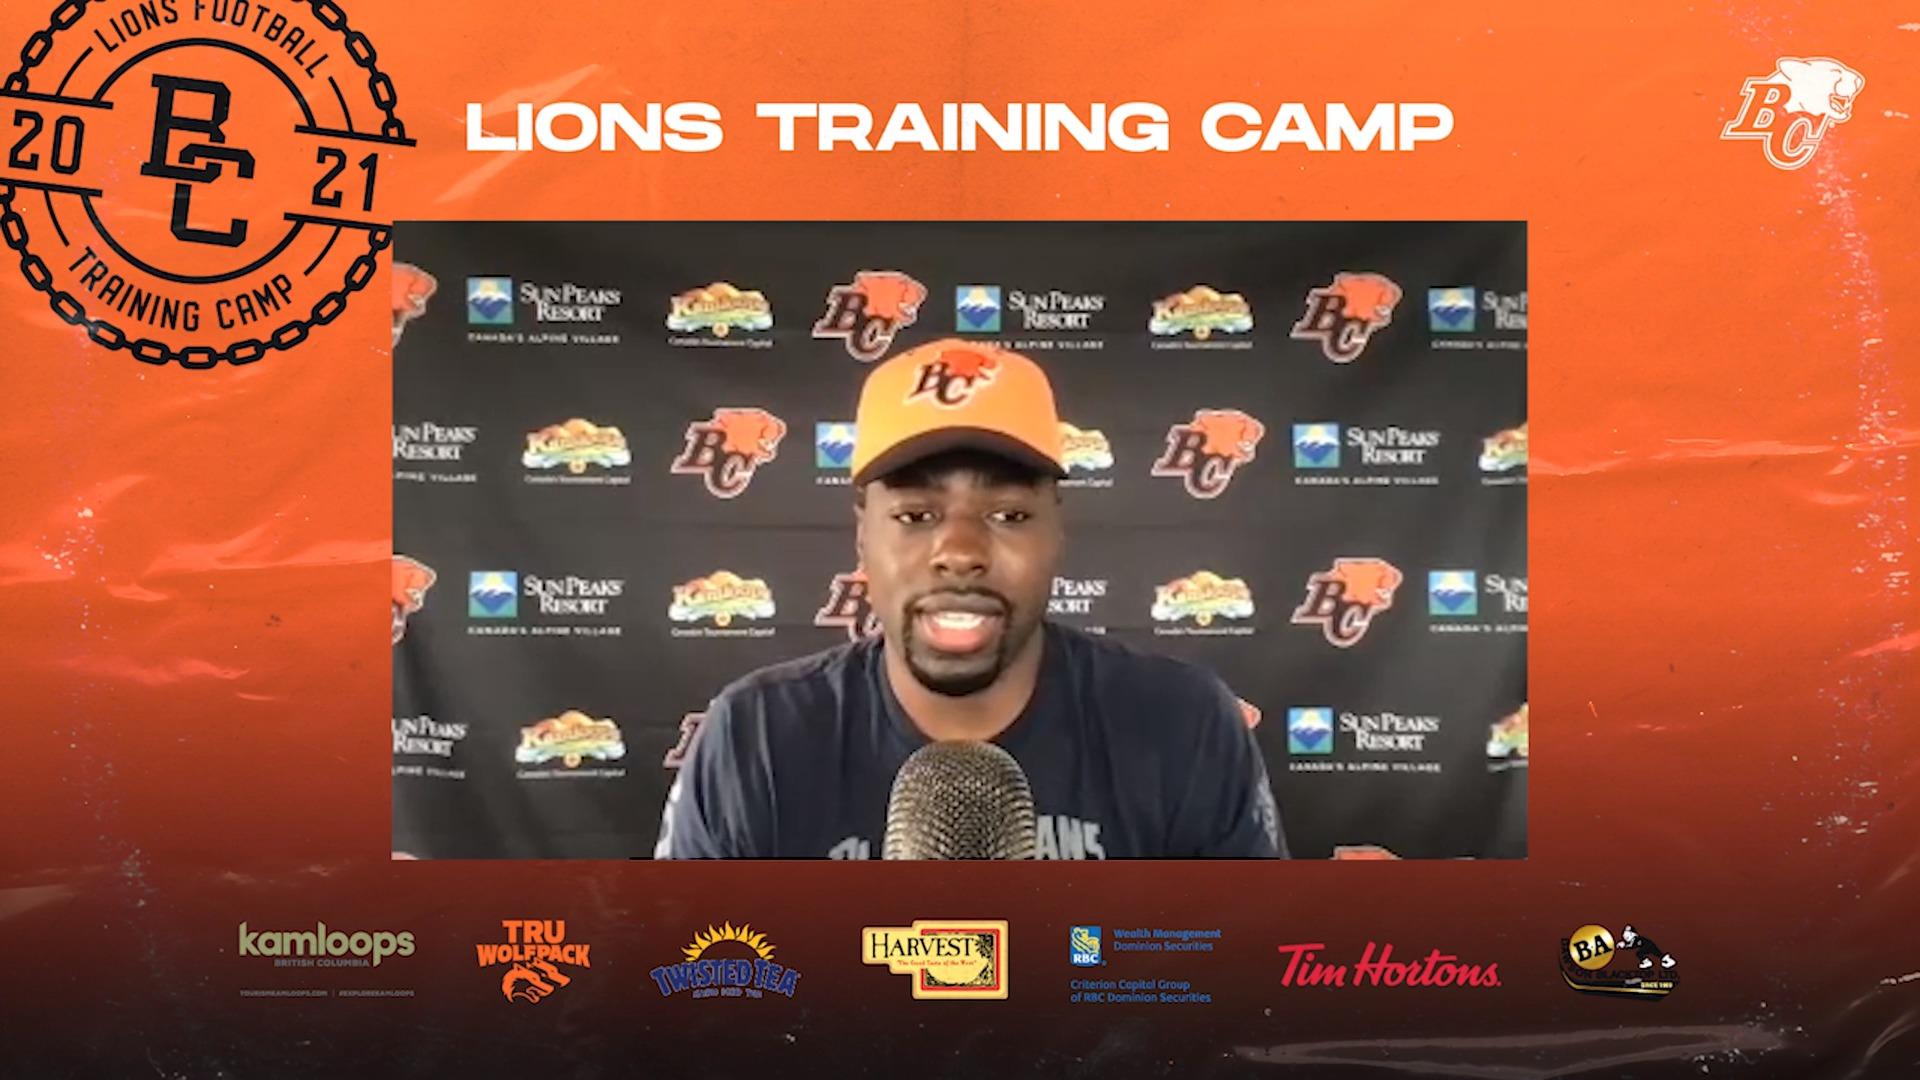 Training Camp July 14 | Jordan X. Williams